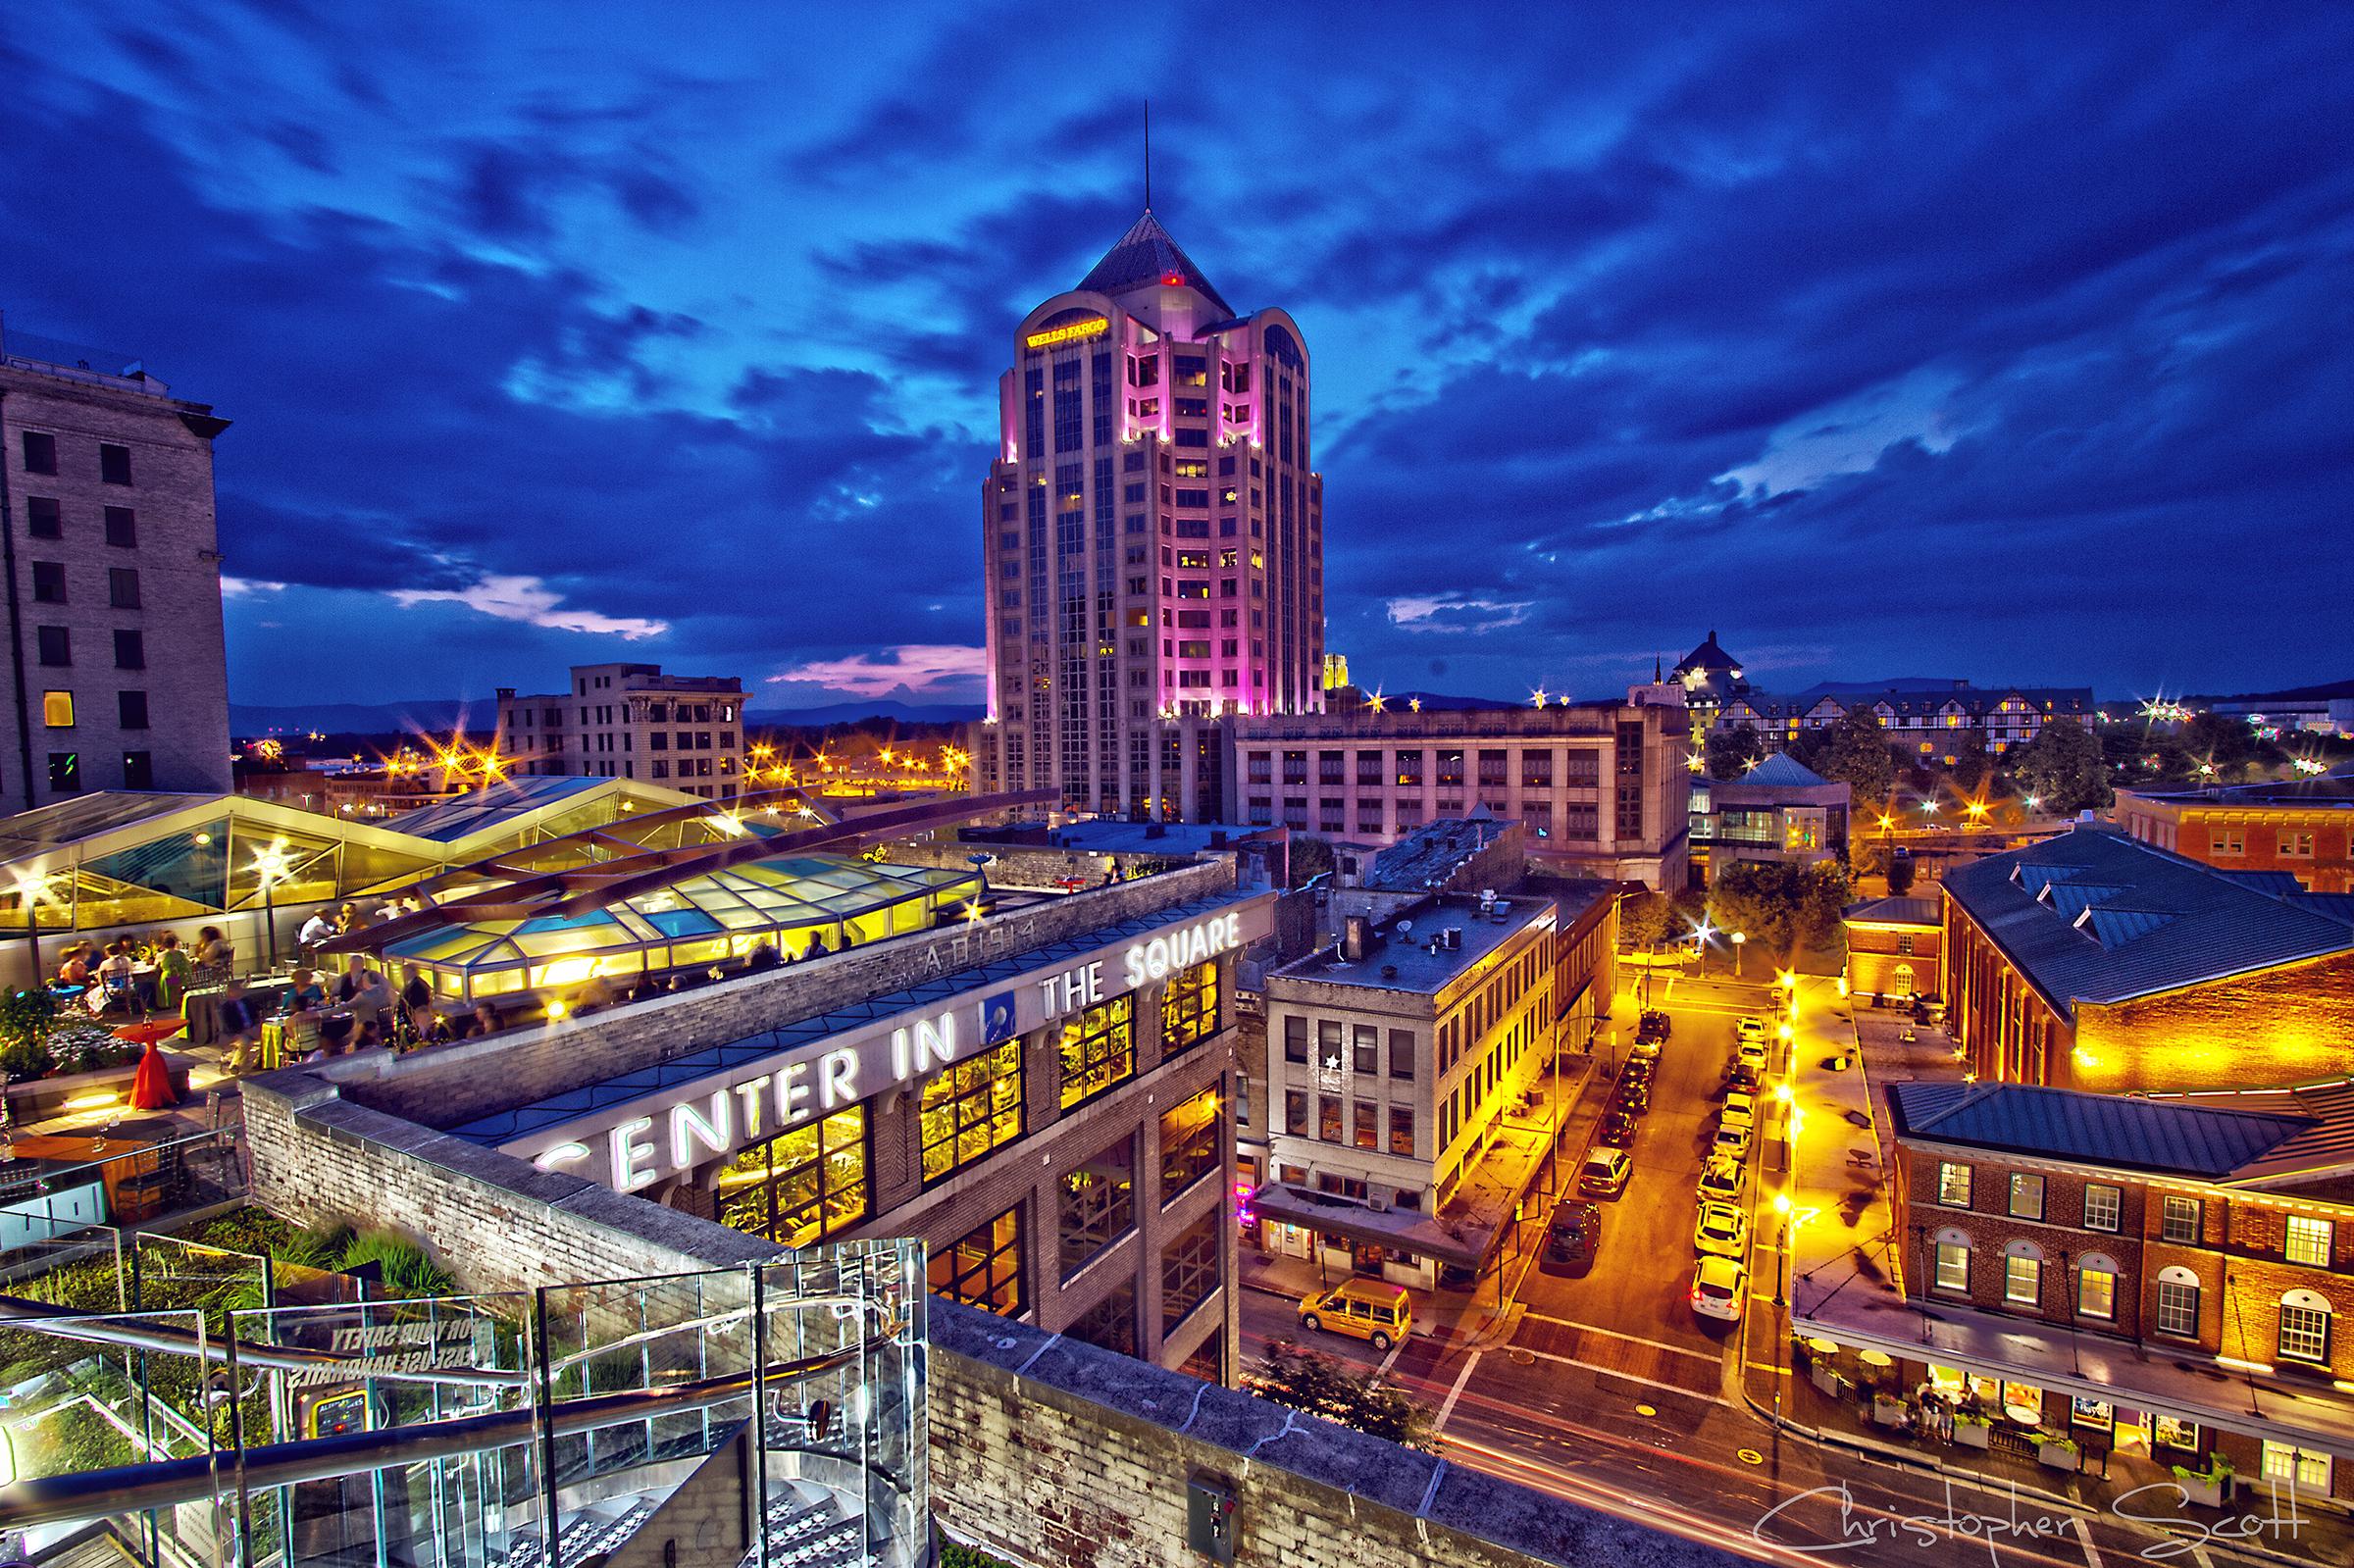 Downtown Roanoke, Virginia